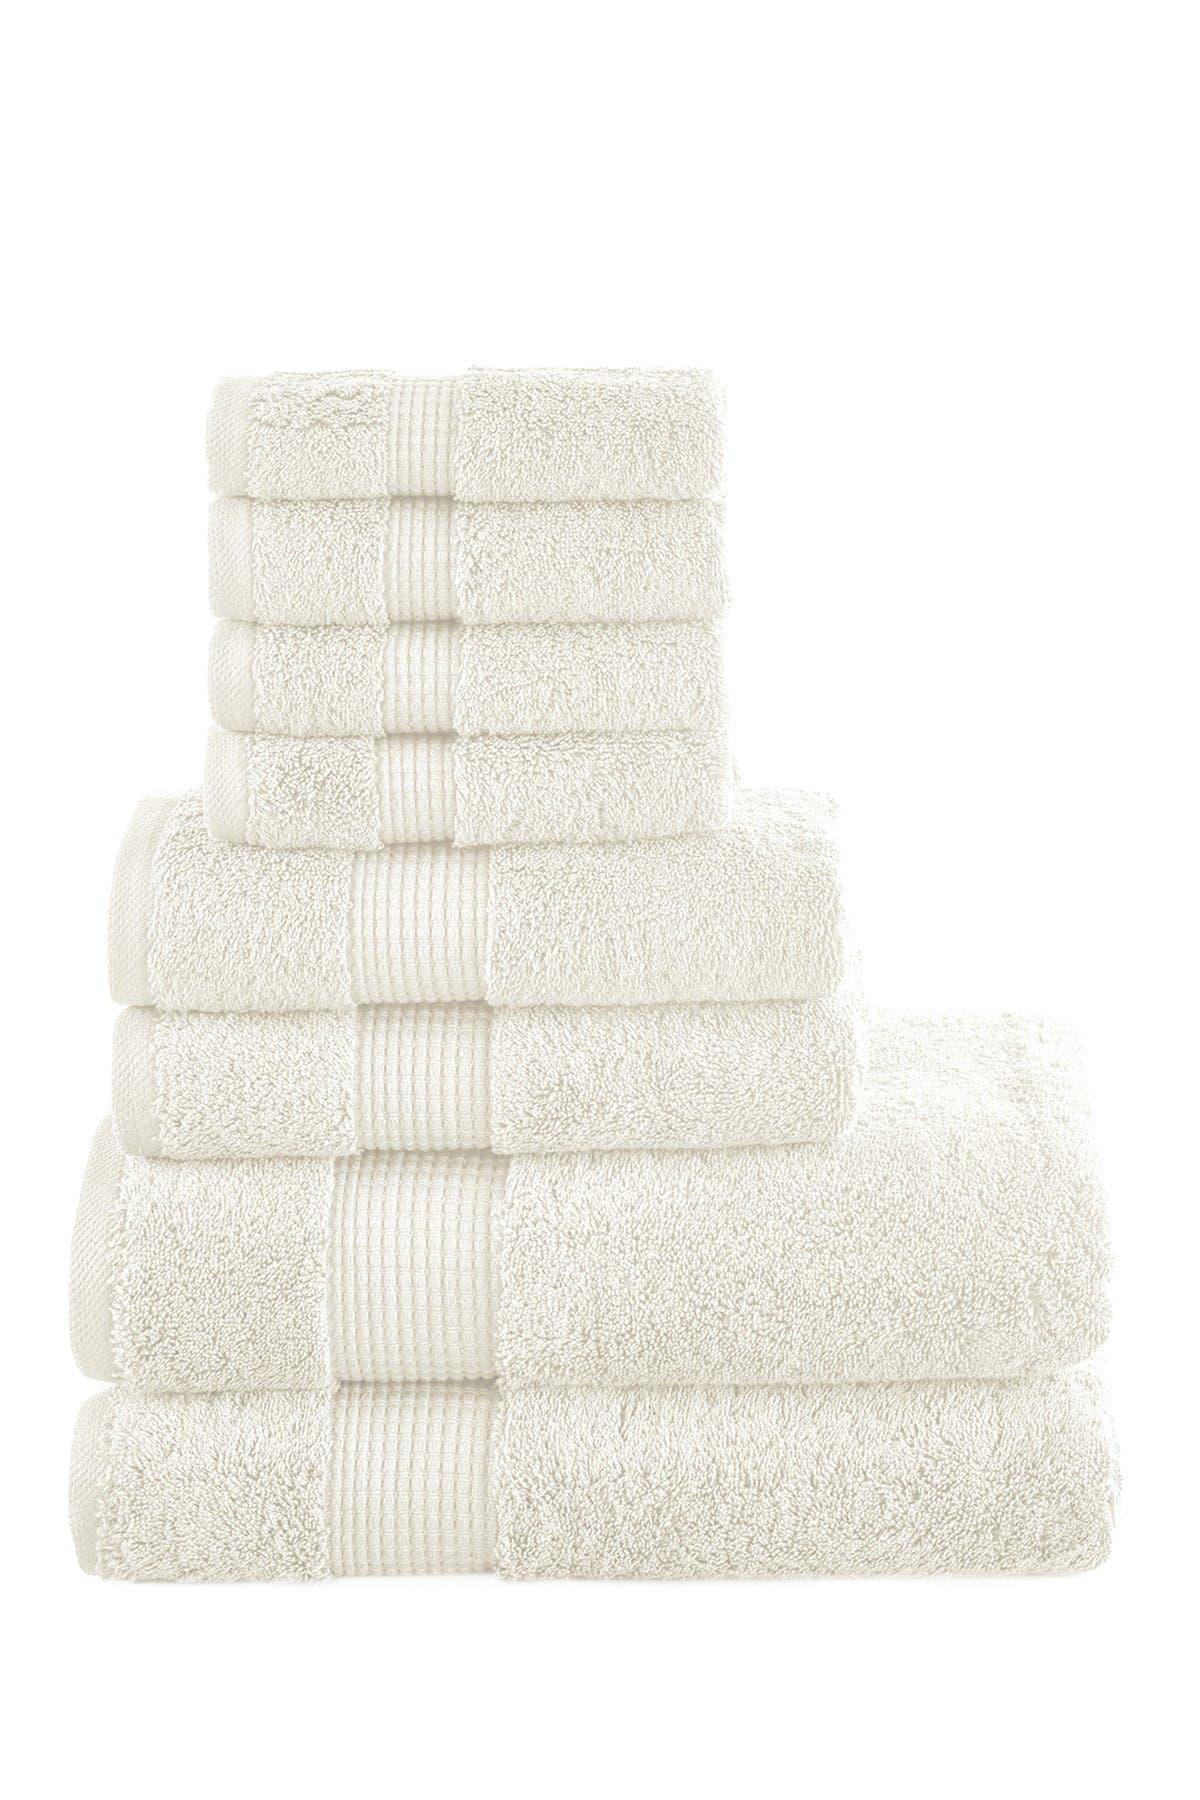 Image of Modern Threads Manor Ridge Turkish Cotton 700 GSM 8-Piece Towel Set - Ivory